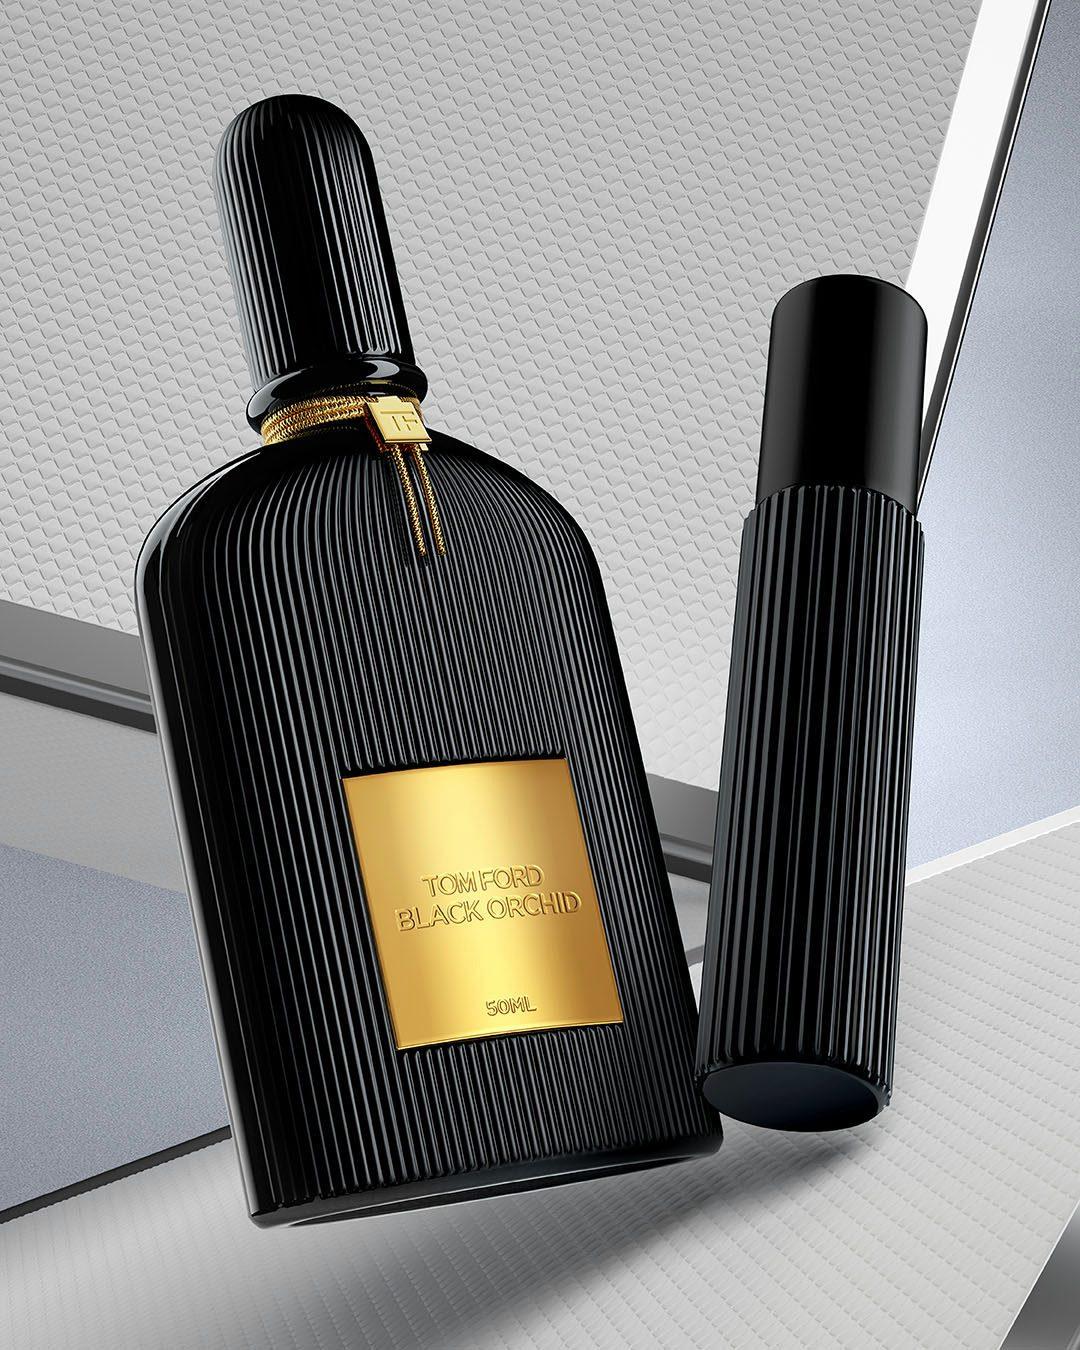 free-tom-ford-black-orchid-parfum-sample